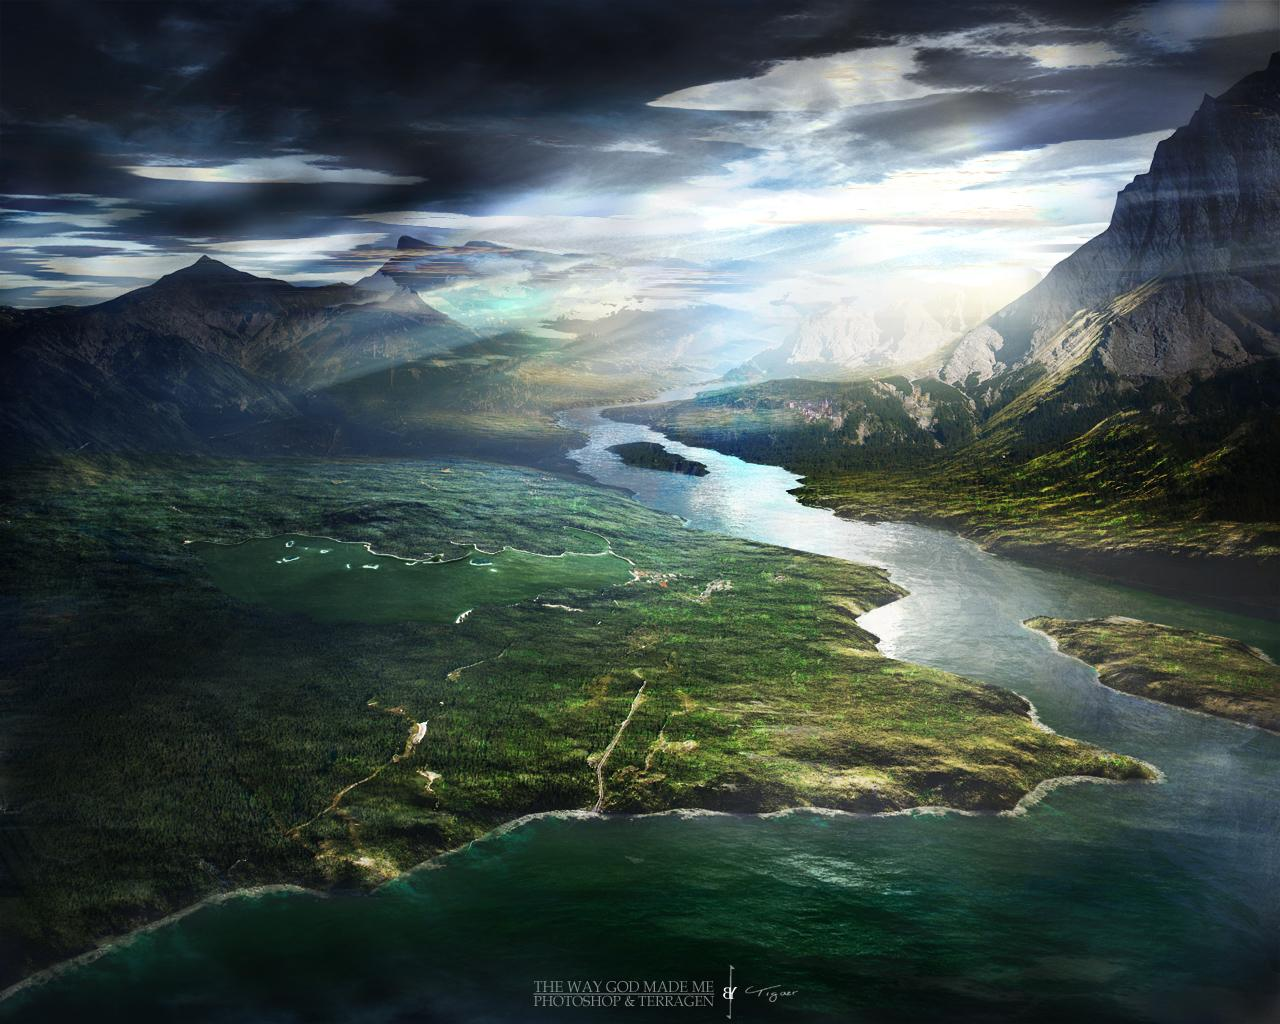 http://3.bp.blogspot.com/-g1zg4H-i3Tw/TVvo9lQE_yI/AAAAAAAAAB8/JldN-KZNOdI/s1600/terragen___The_Way_God_Made_Me.jpg